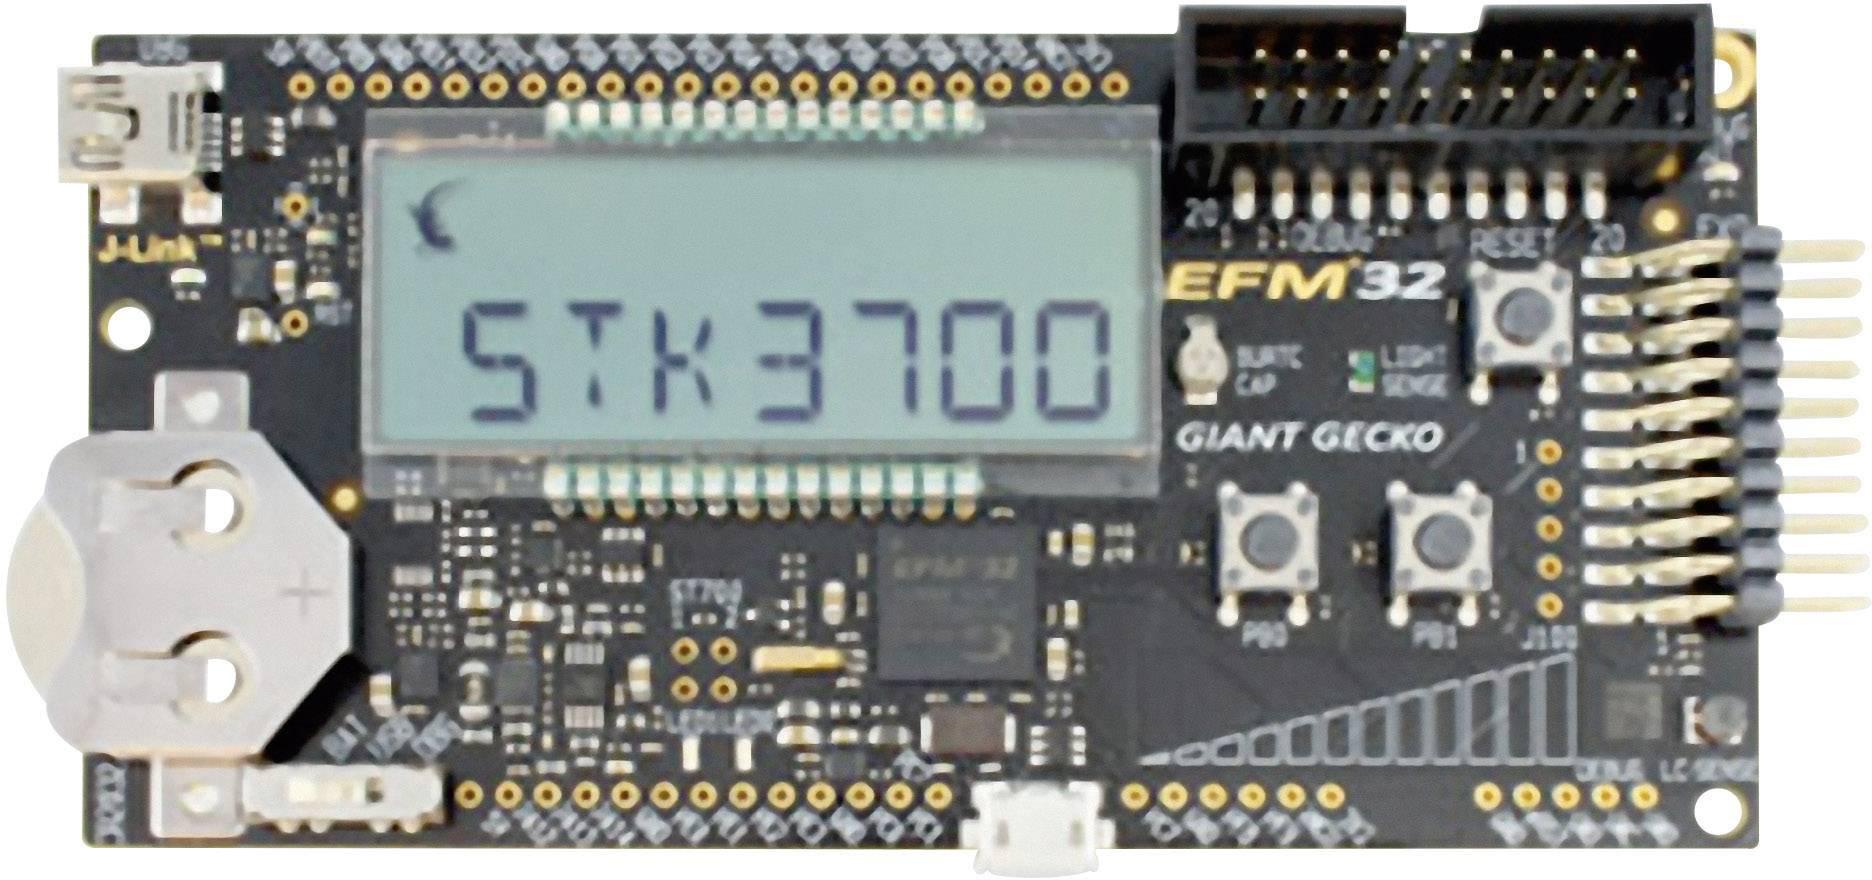 Vývojová deska Silicon Labs EFM32GG-STK3700